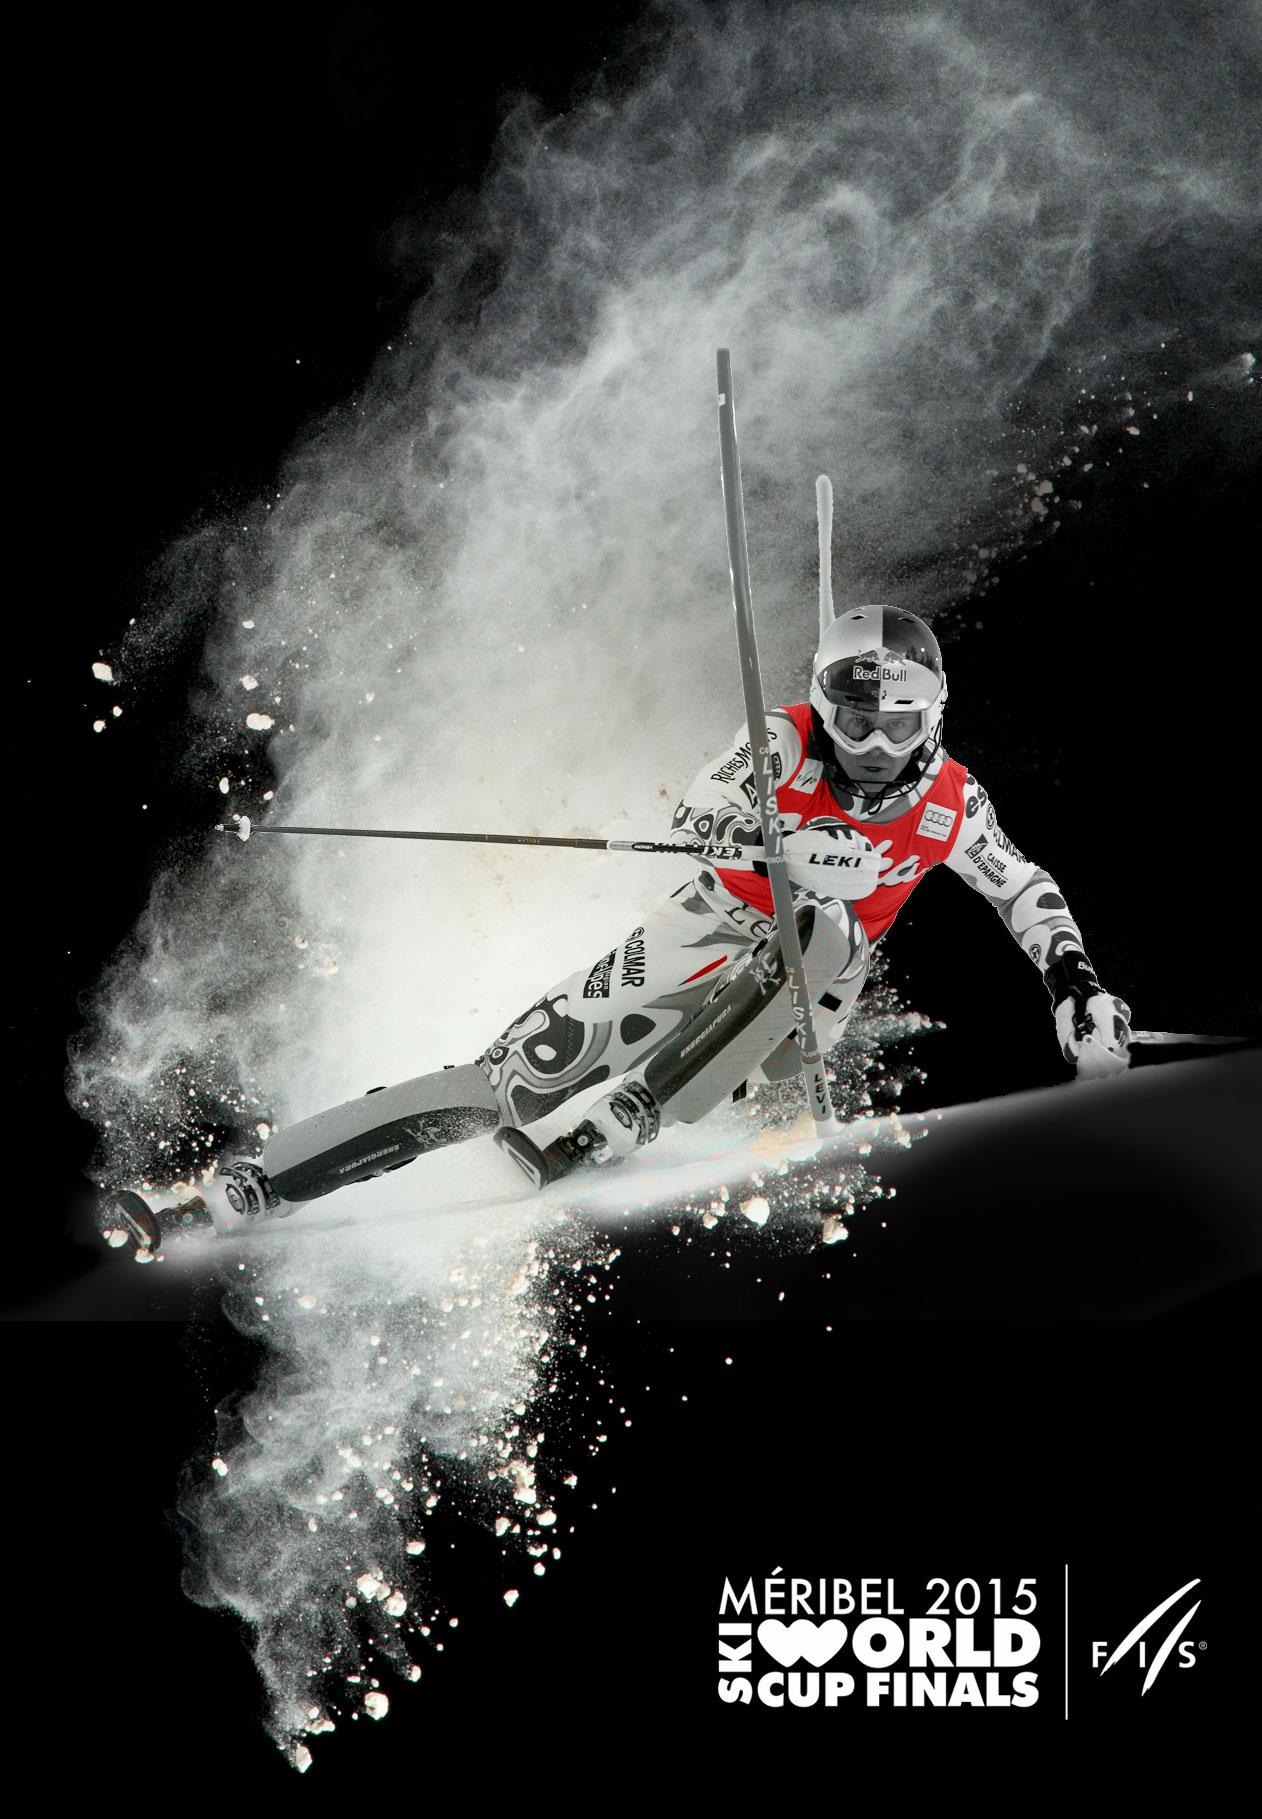 affiche meribel finale coupe du monde de ski alpin 2015